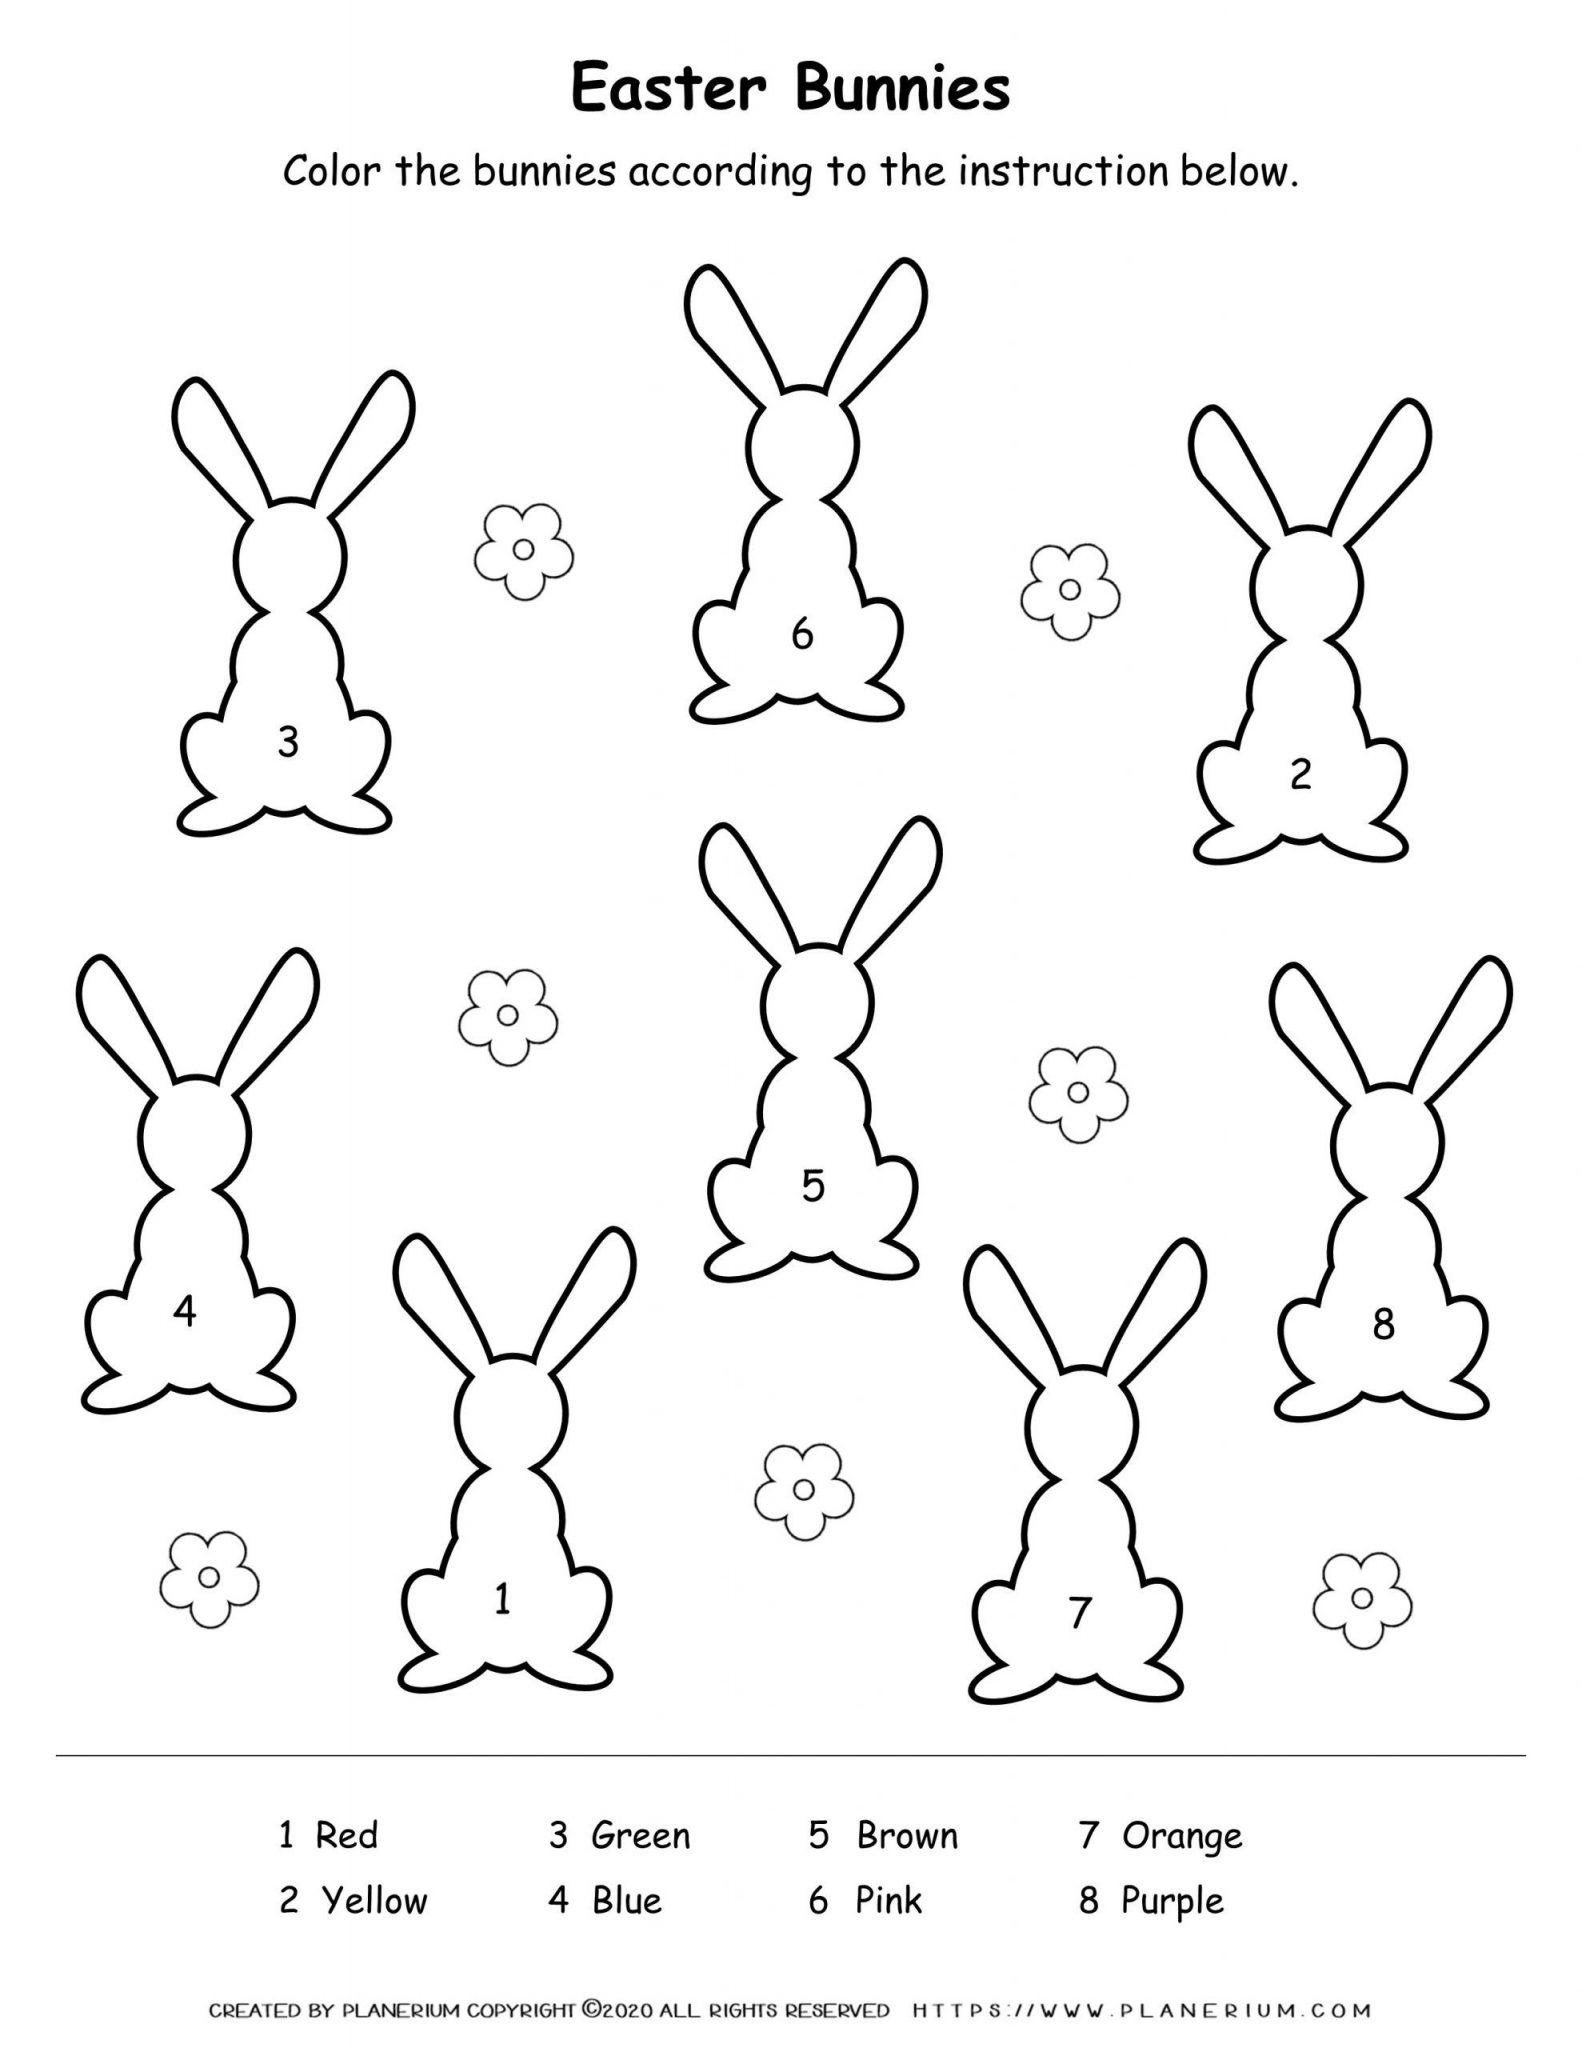 Easter Bunny coloring worksheet